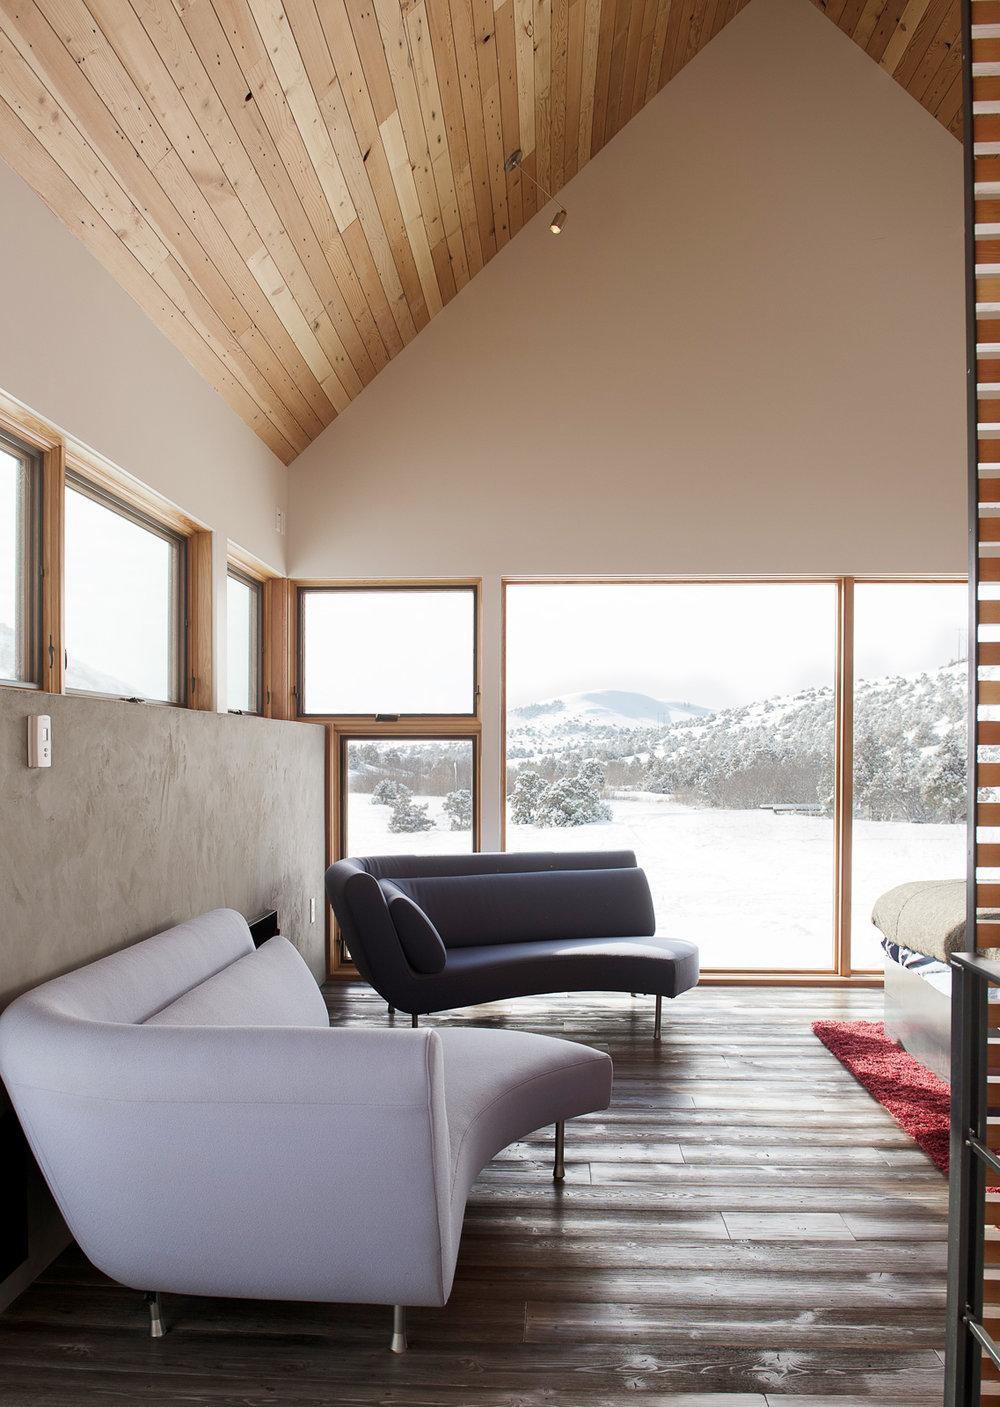 Woodworks-West-Bozeman-Montana-Builder-Cabinetry-Remodel-New-Construction-4514.jpg